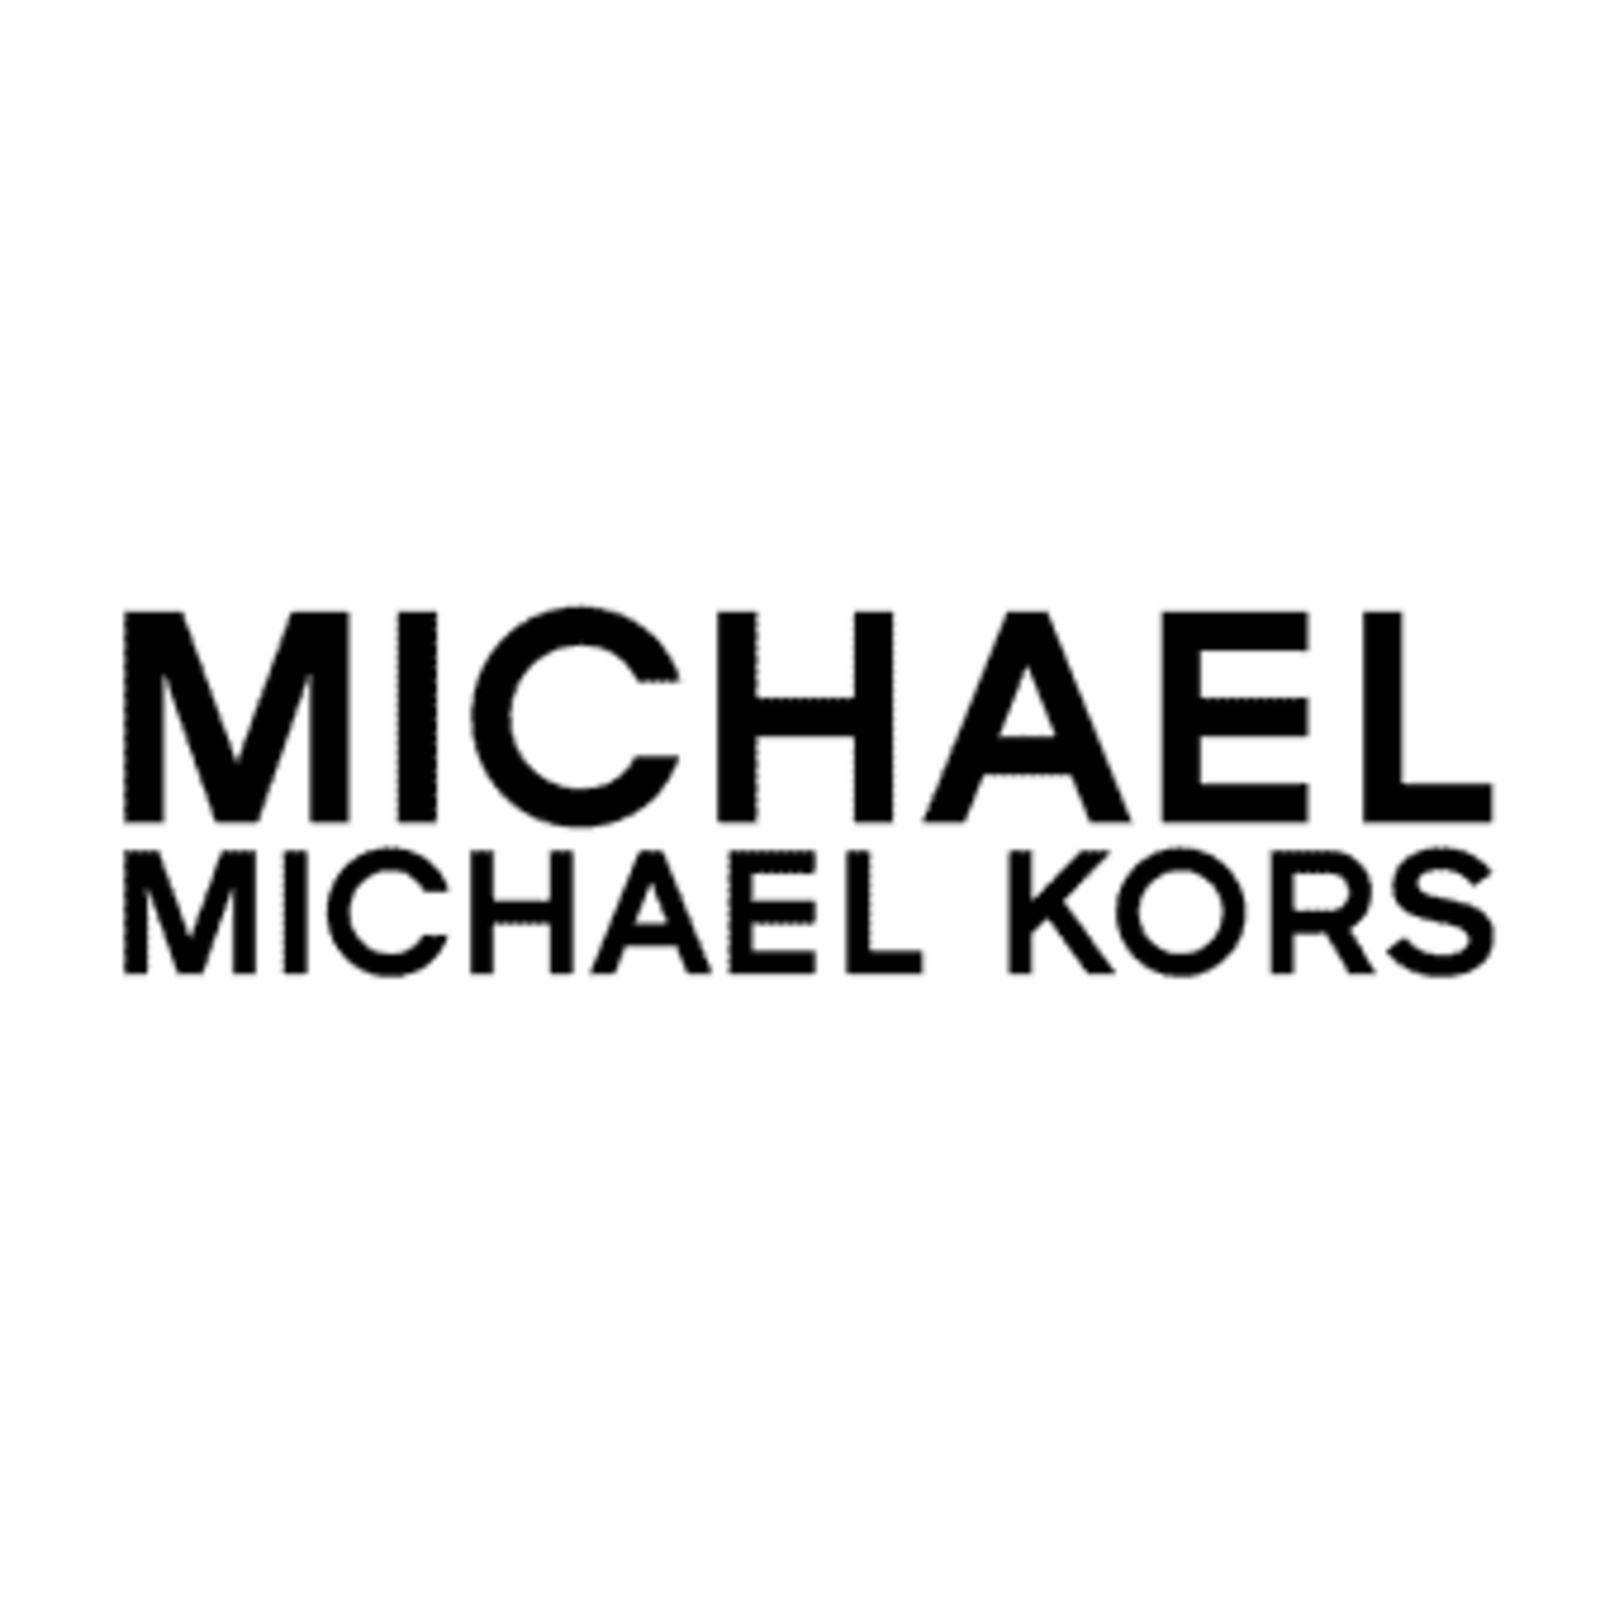 MICHAEL MICHAEL KORS (Image 1)